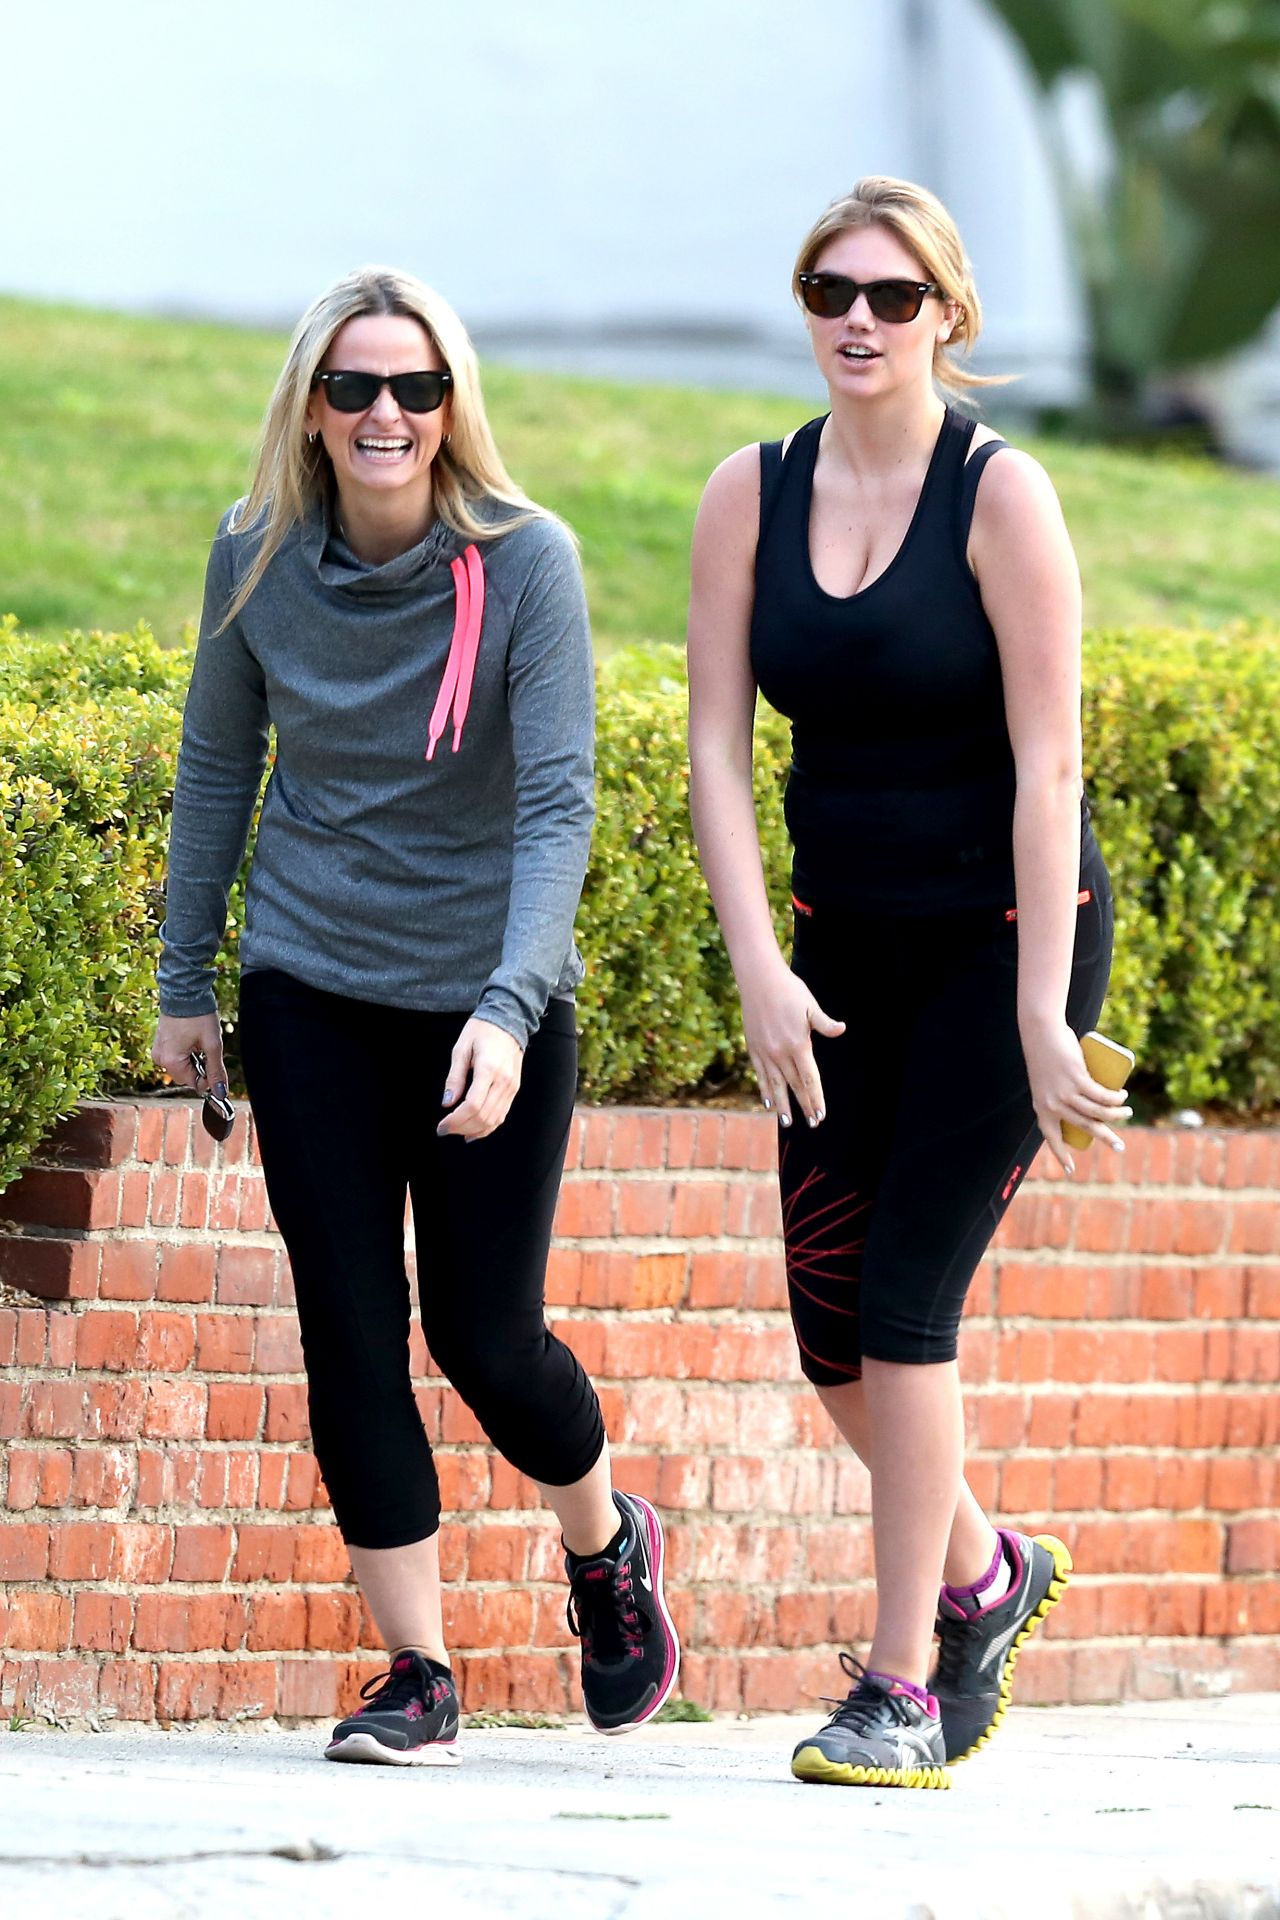 Kate upton fat